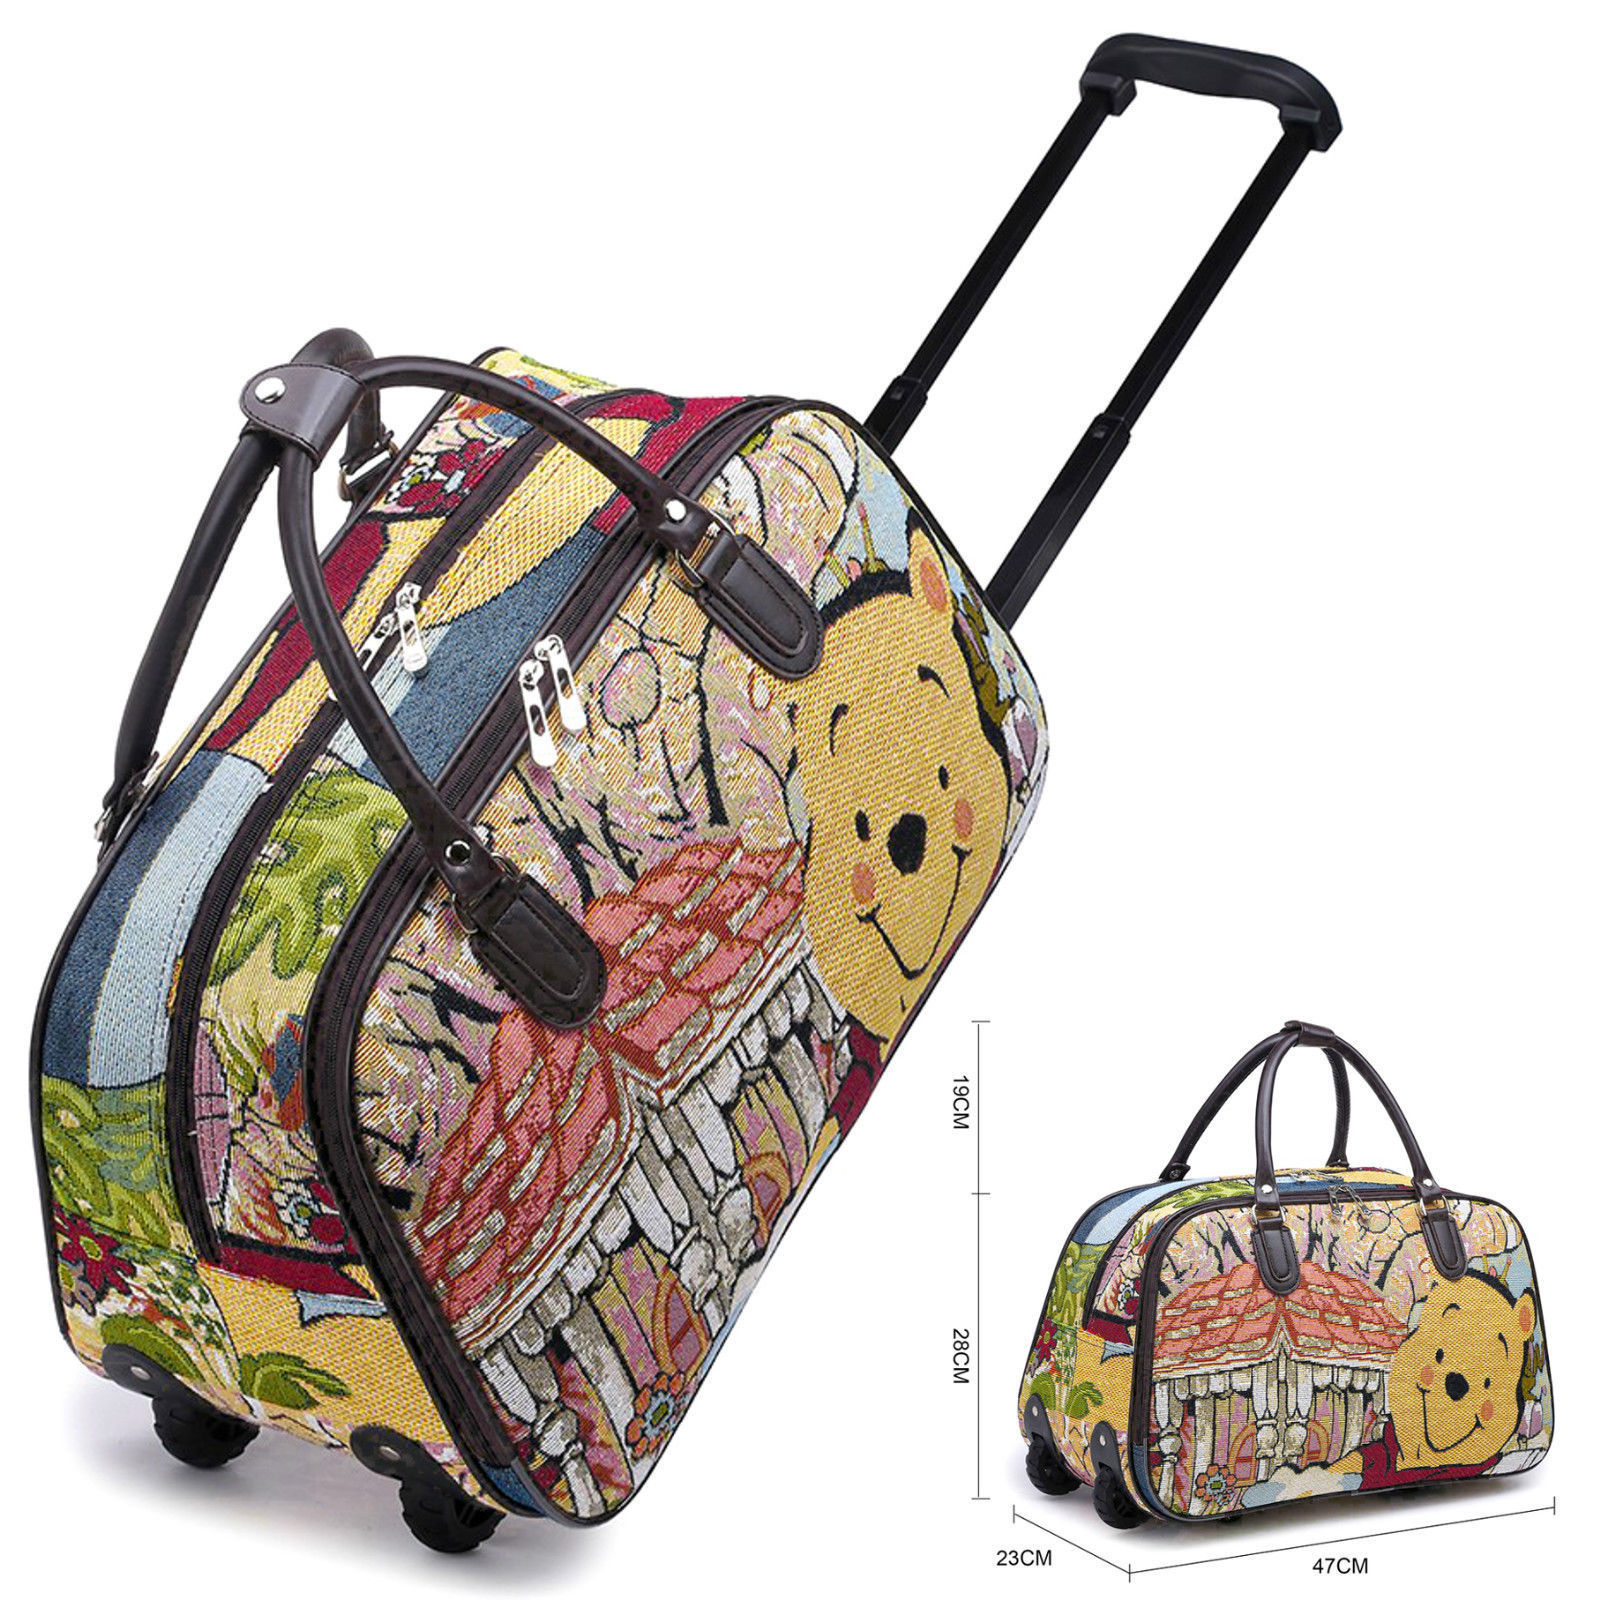 Details about Disney Winnie Pooh   Vintage Holdall Trolley Bag 622383e79